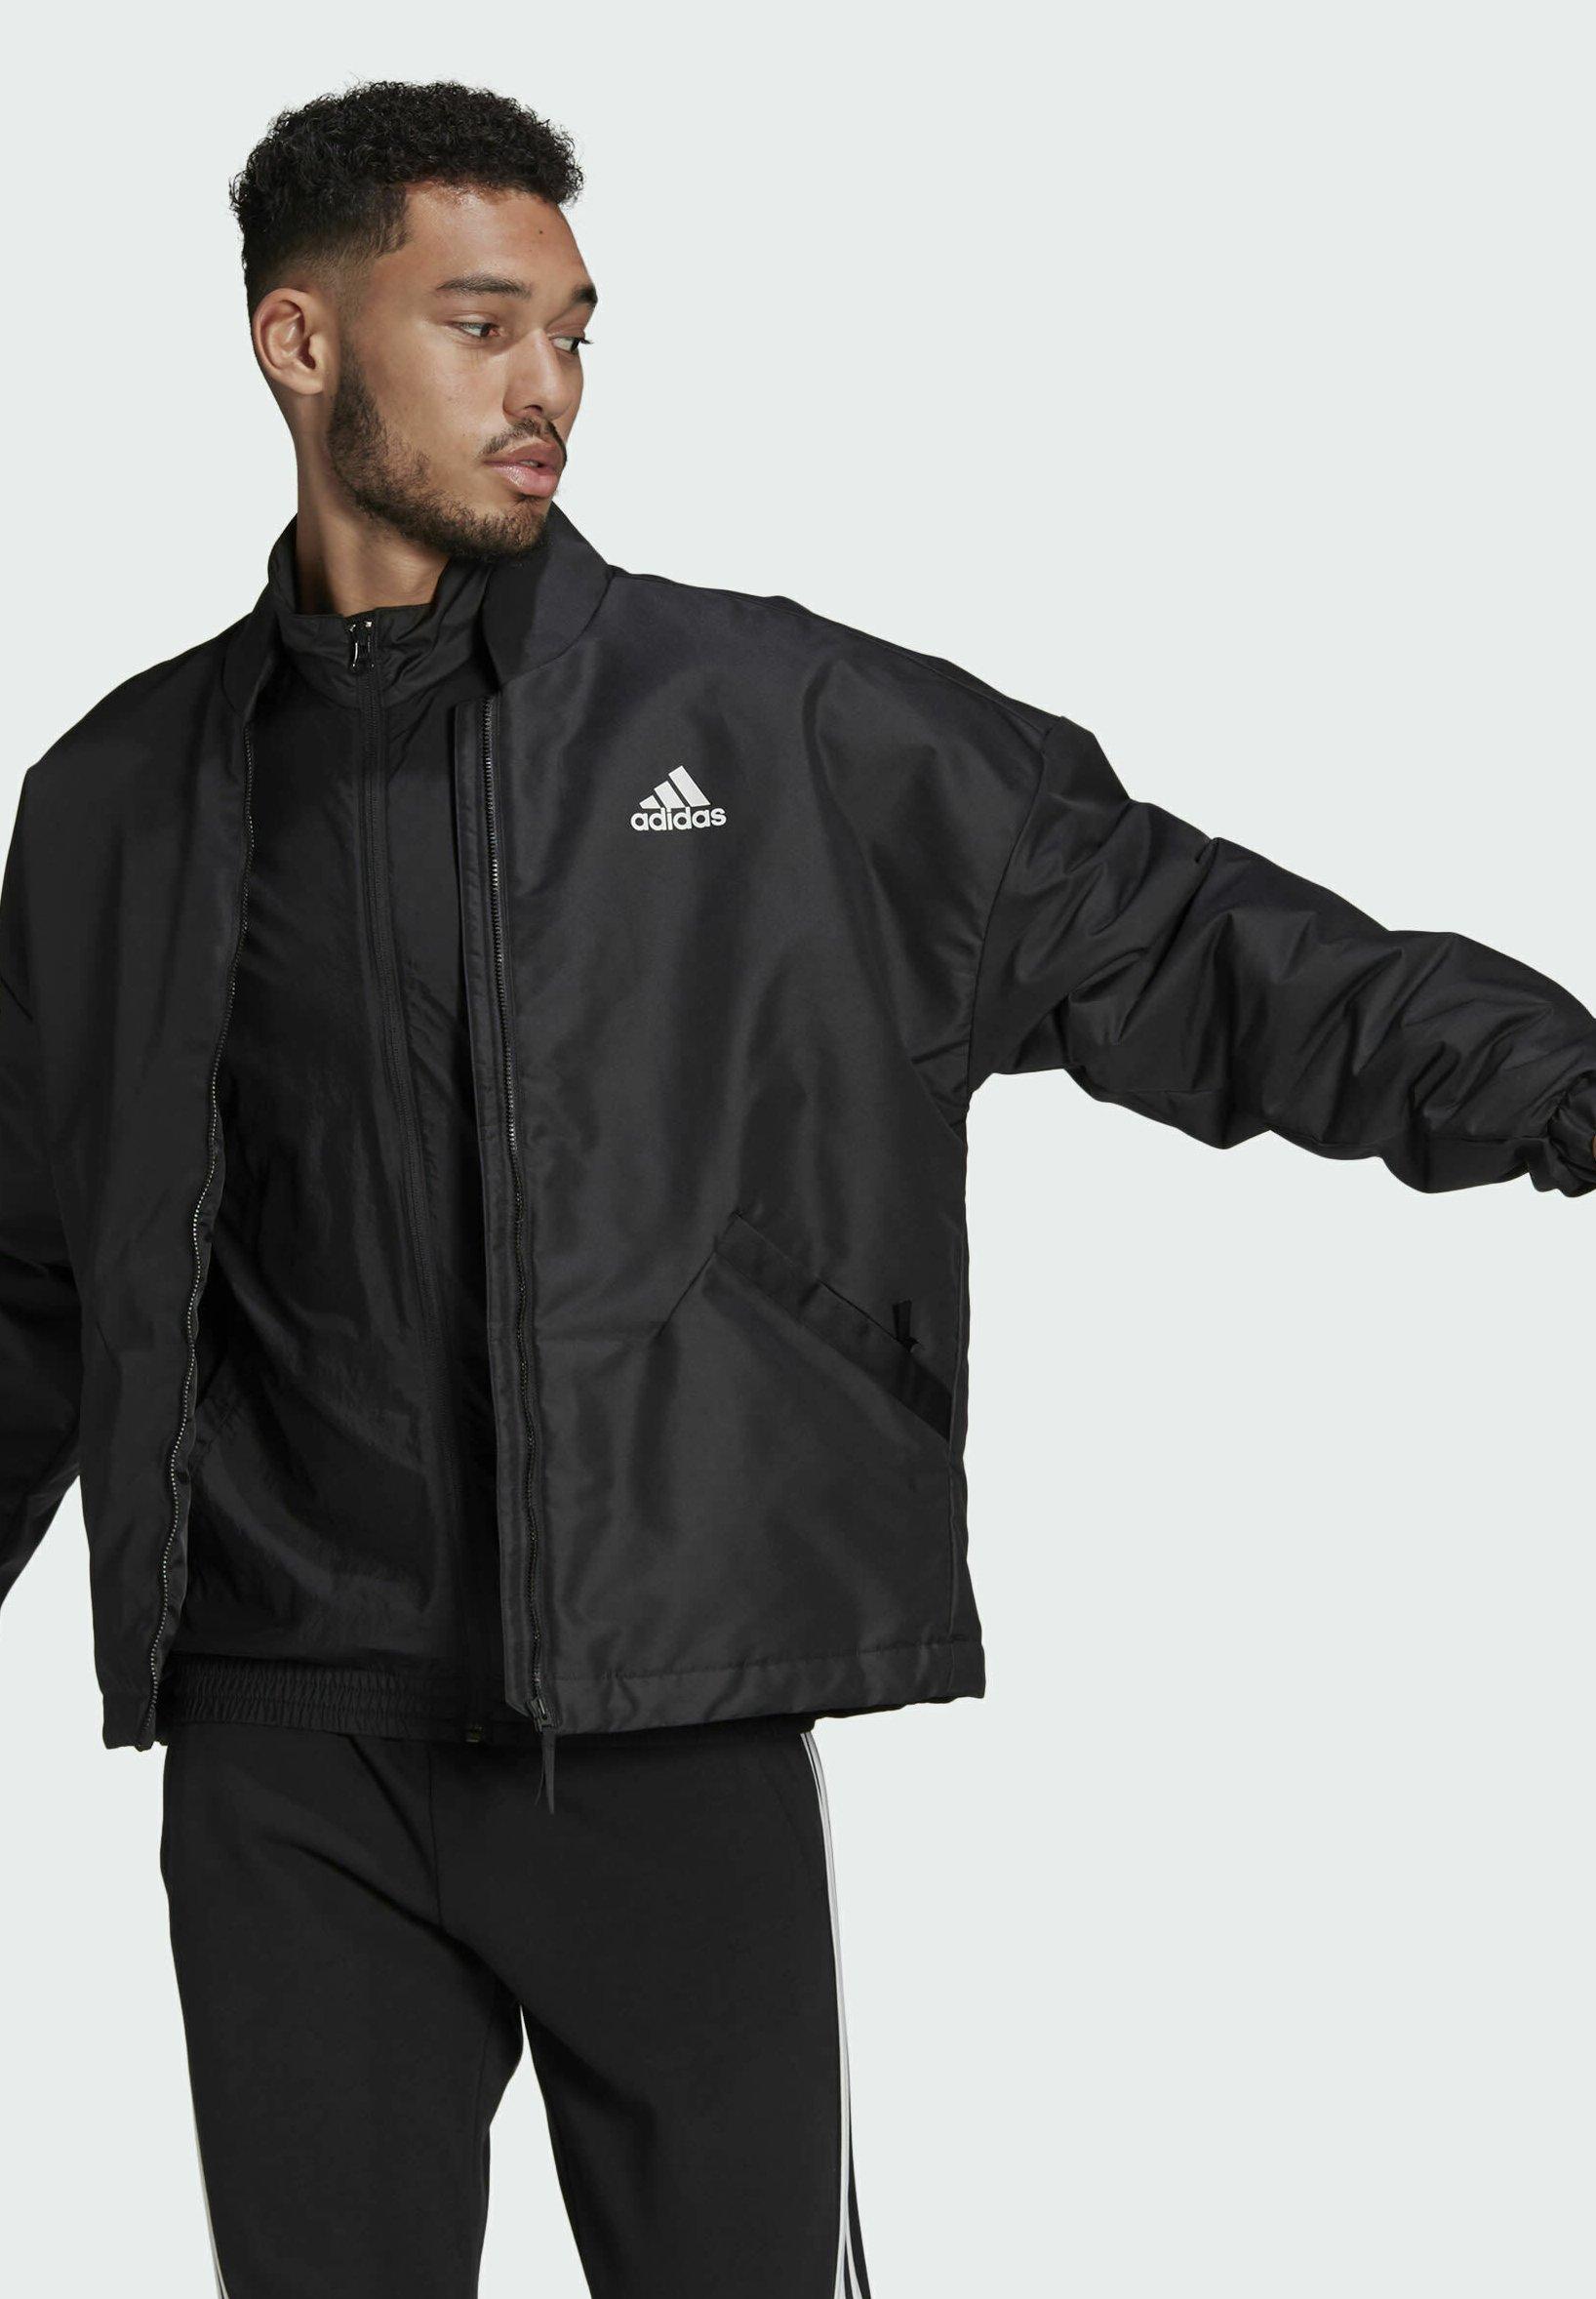 Men BACK TO SPORT LIGHT INSULATED JACKET - Training jacket